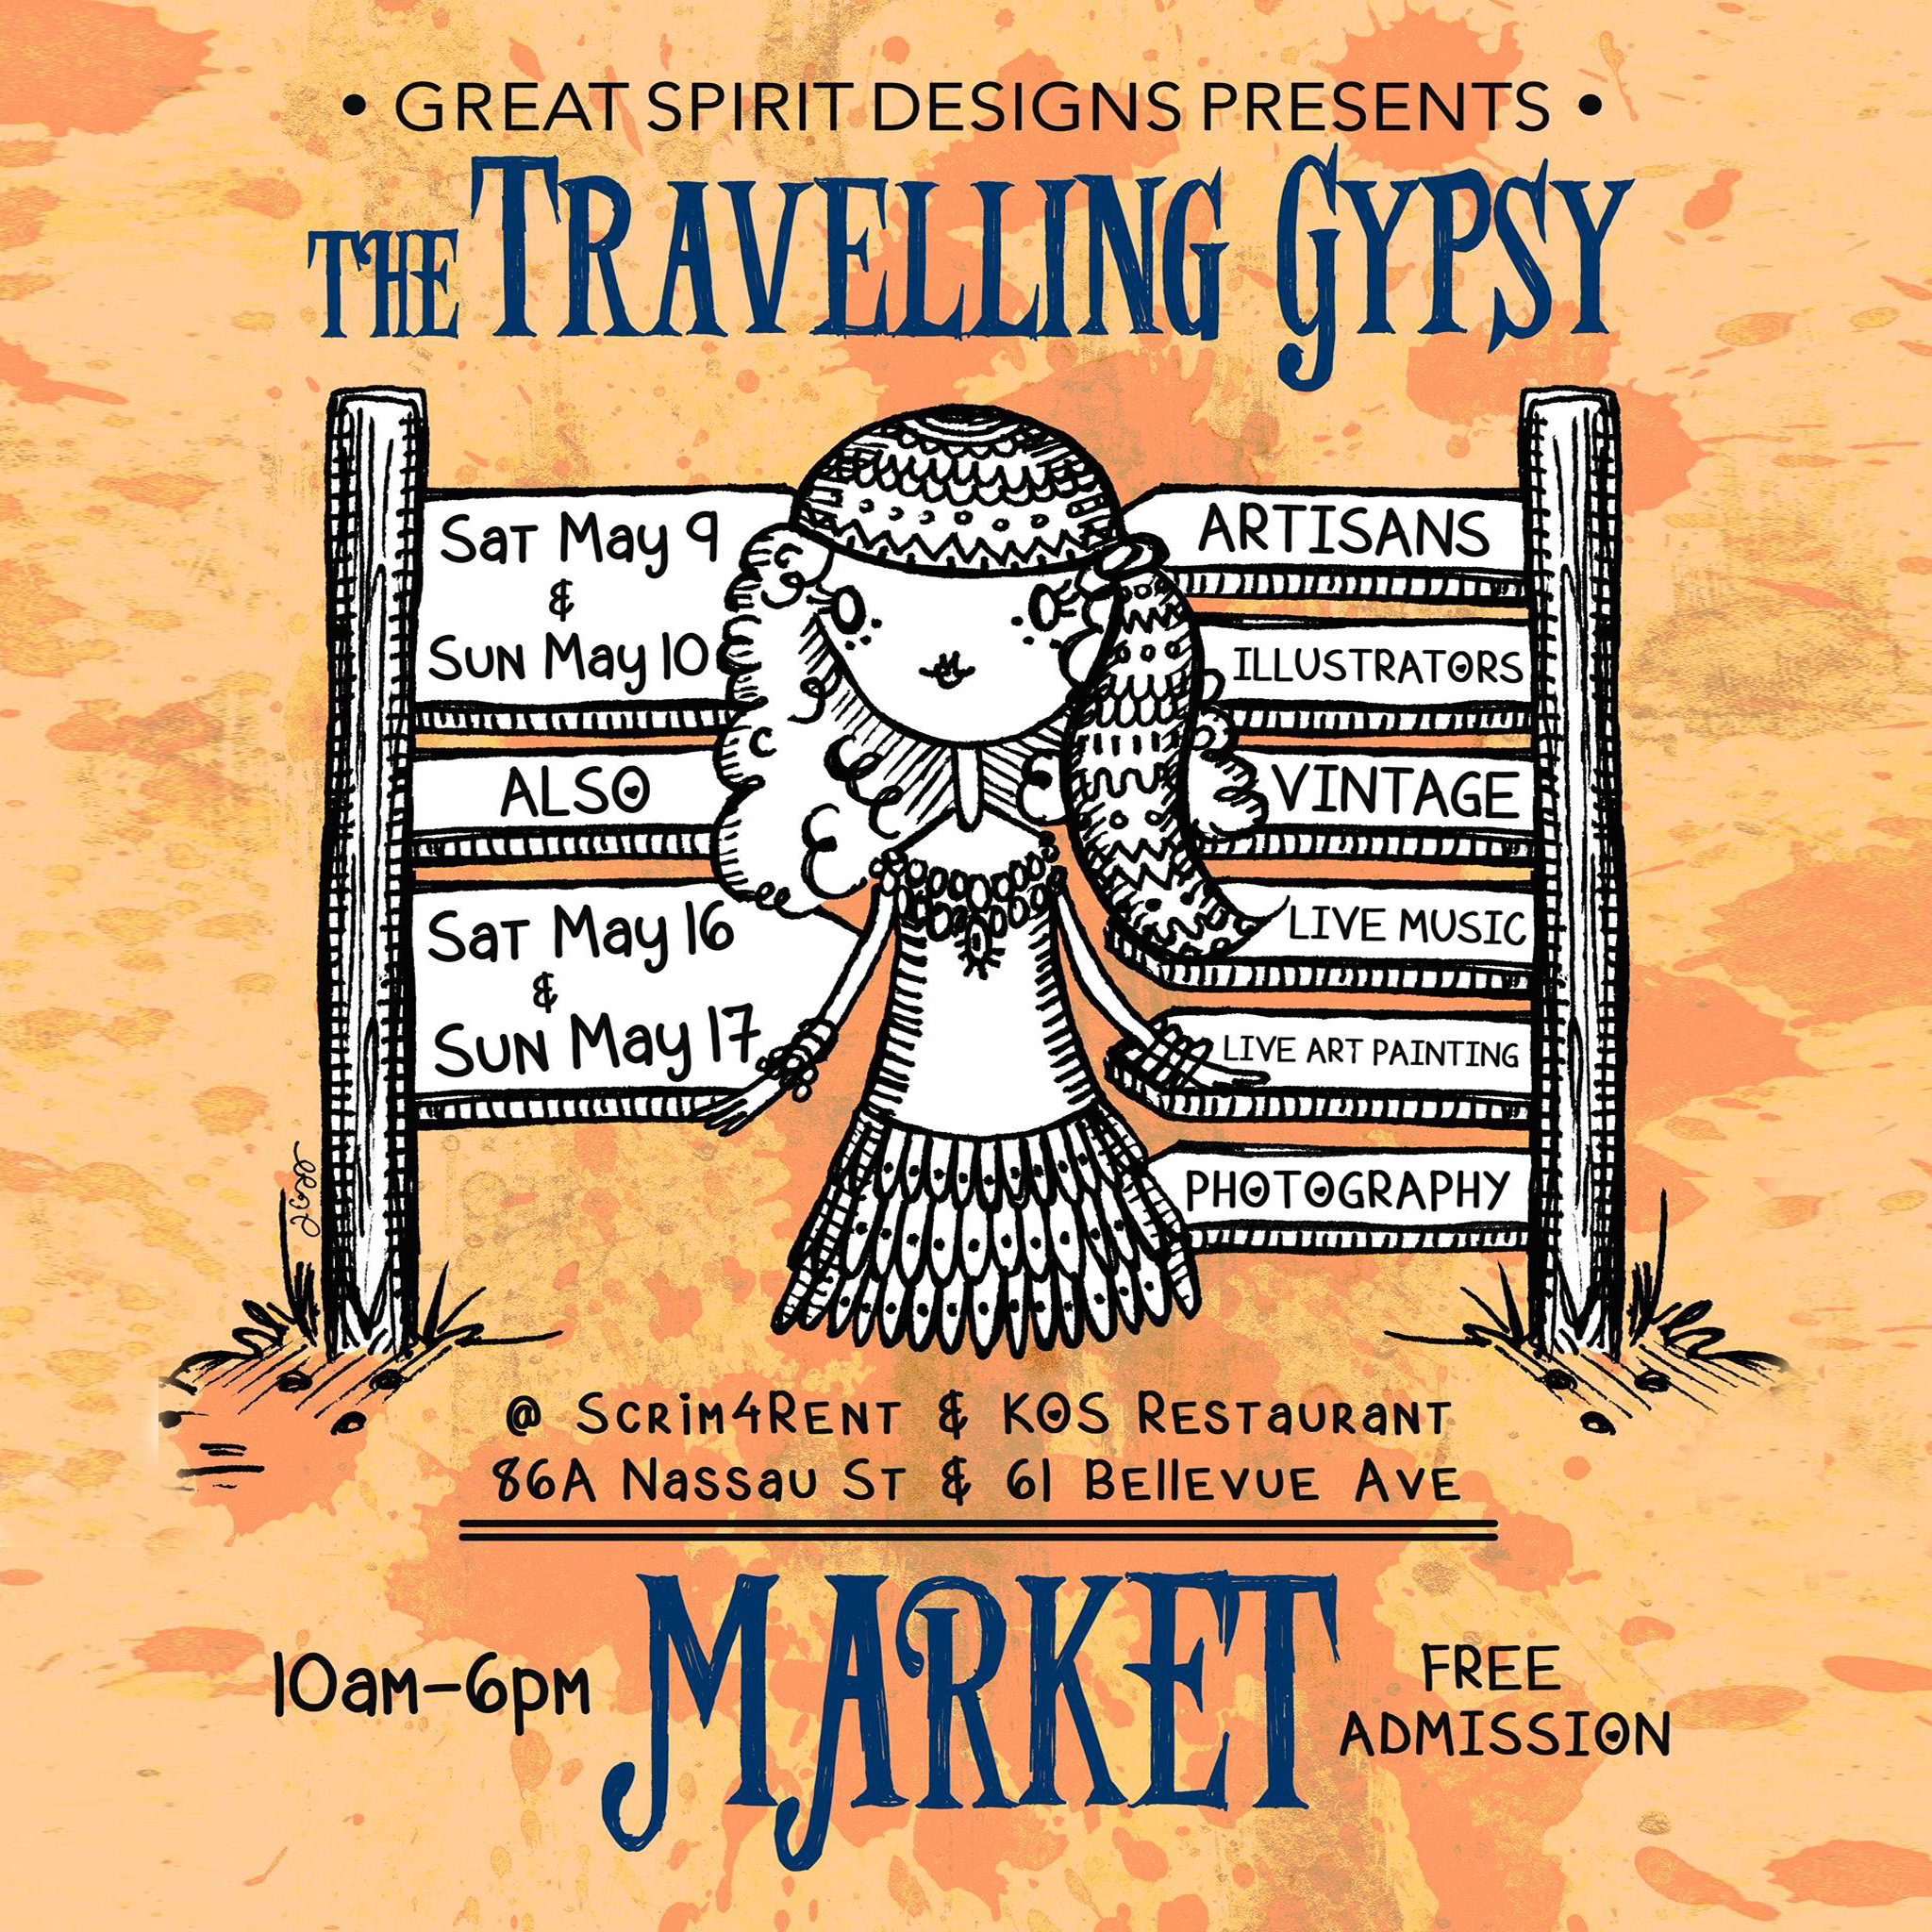 TravellingGypsy